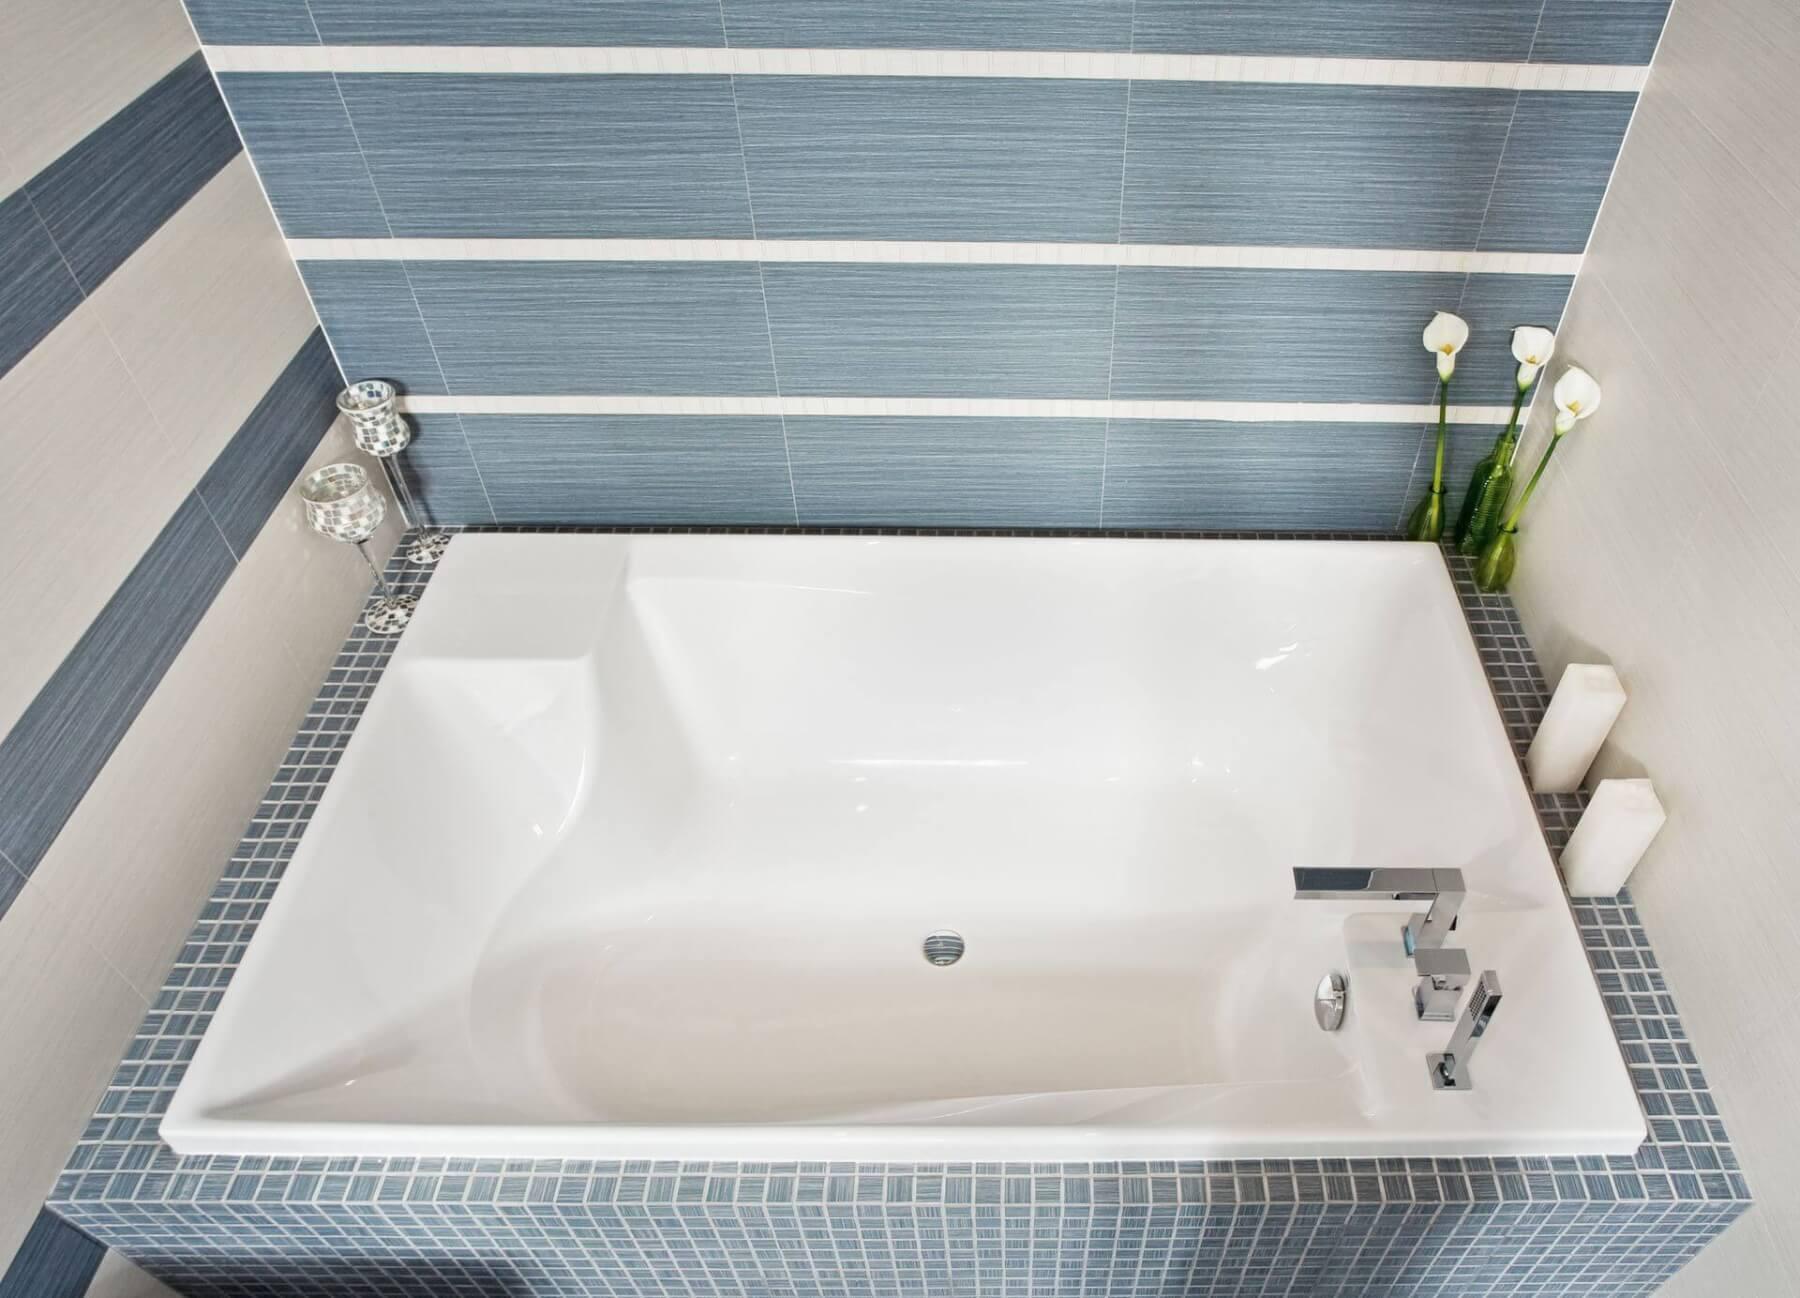 Materiali per vasche da bagno moderne  Artebagno